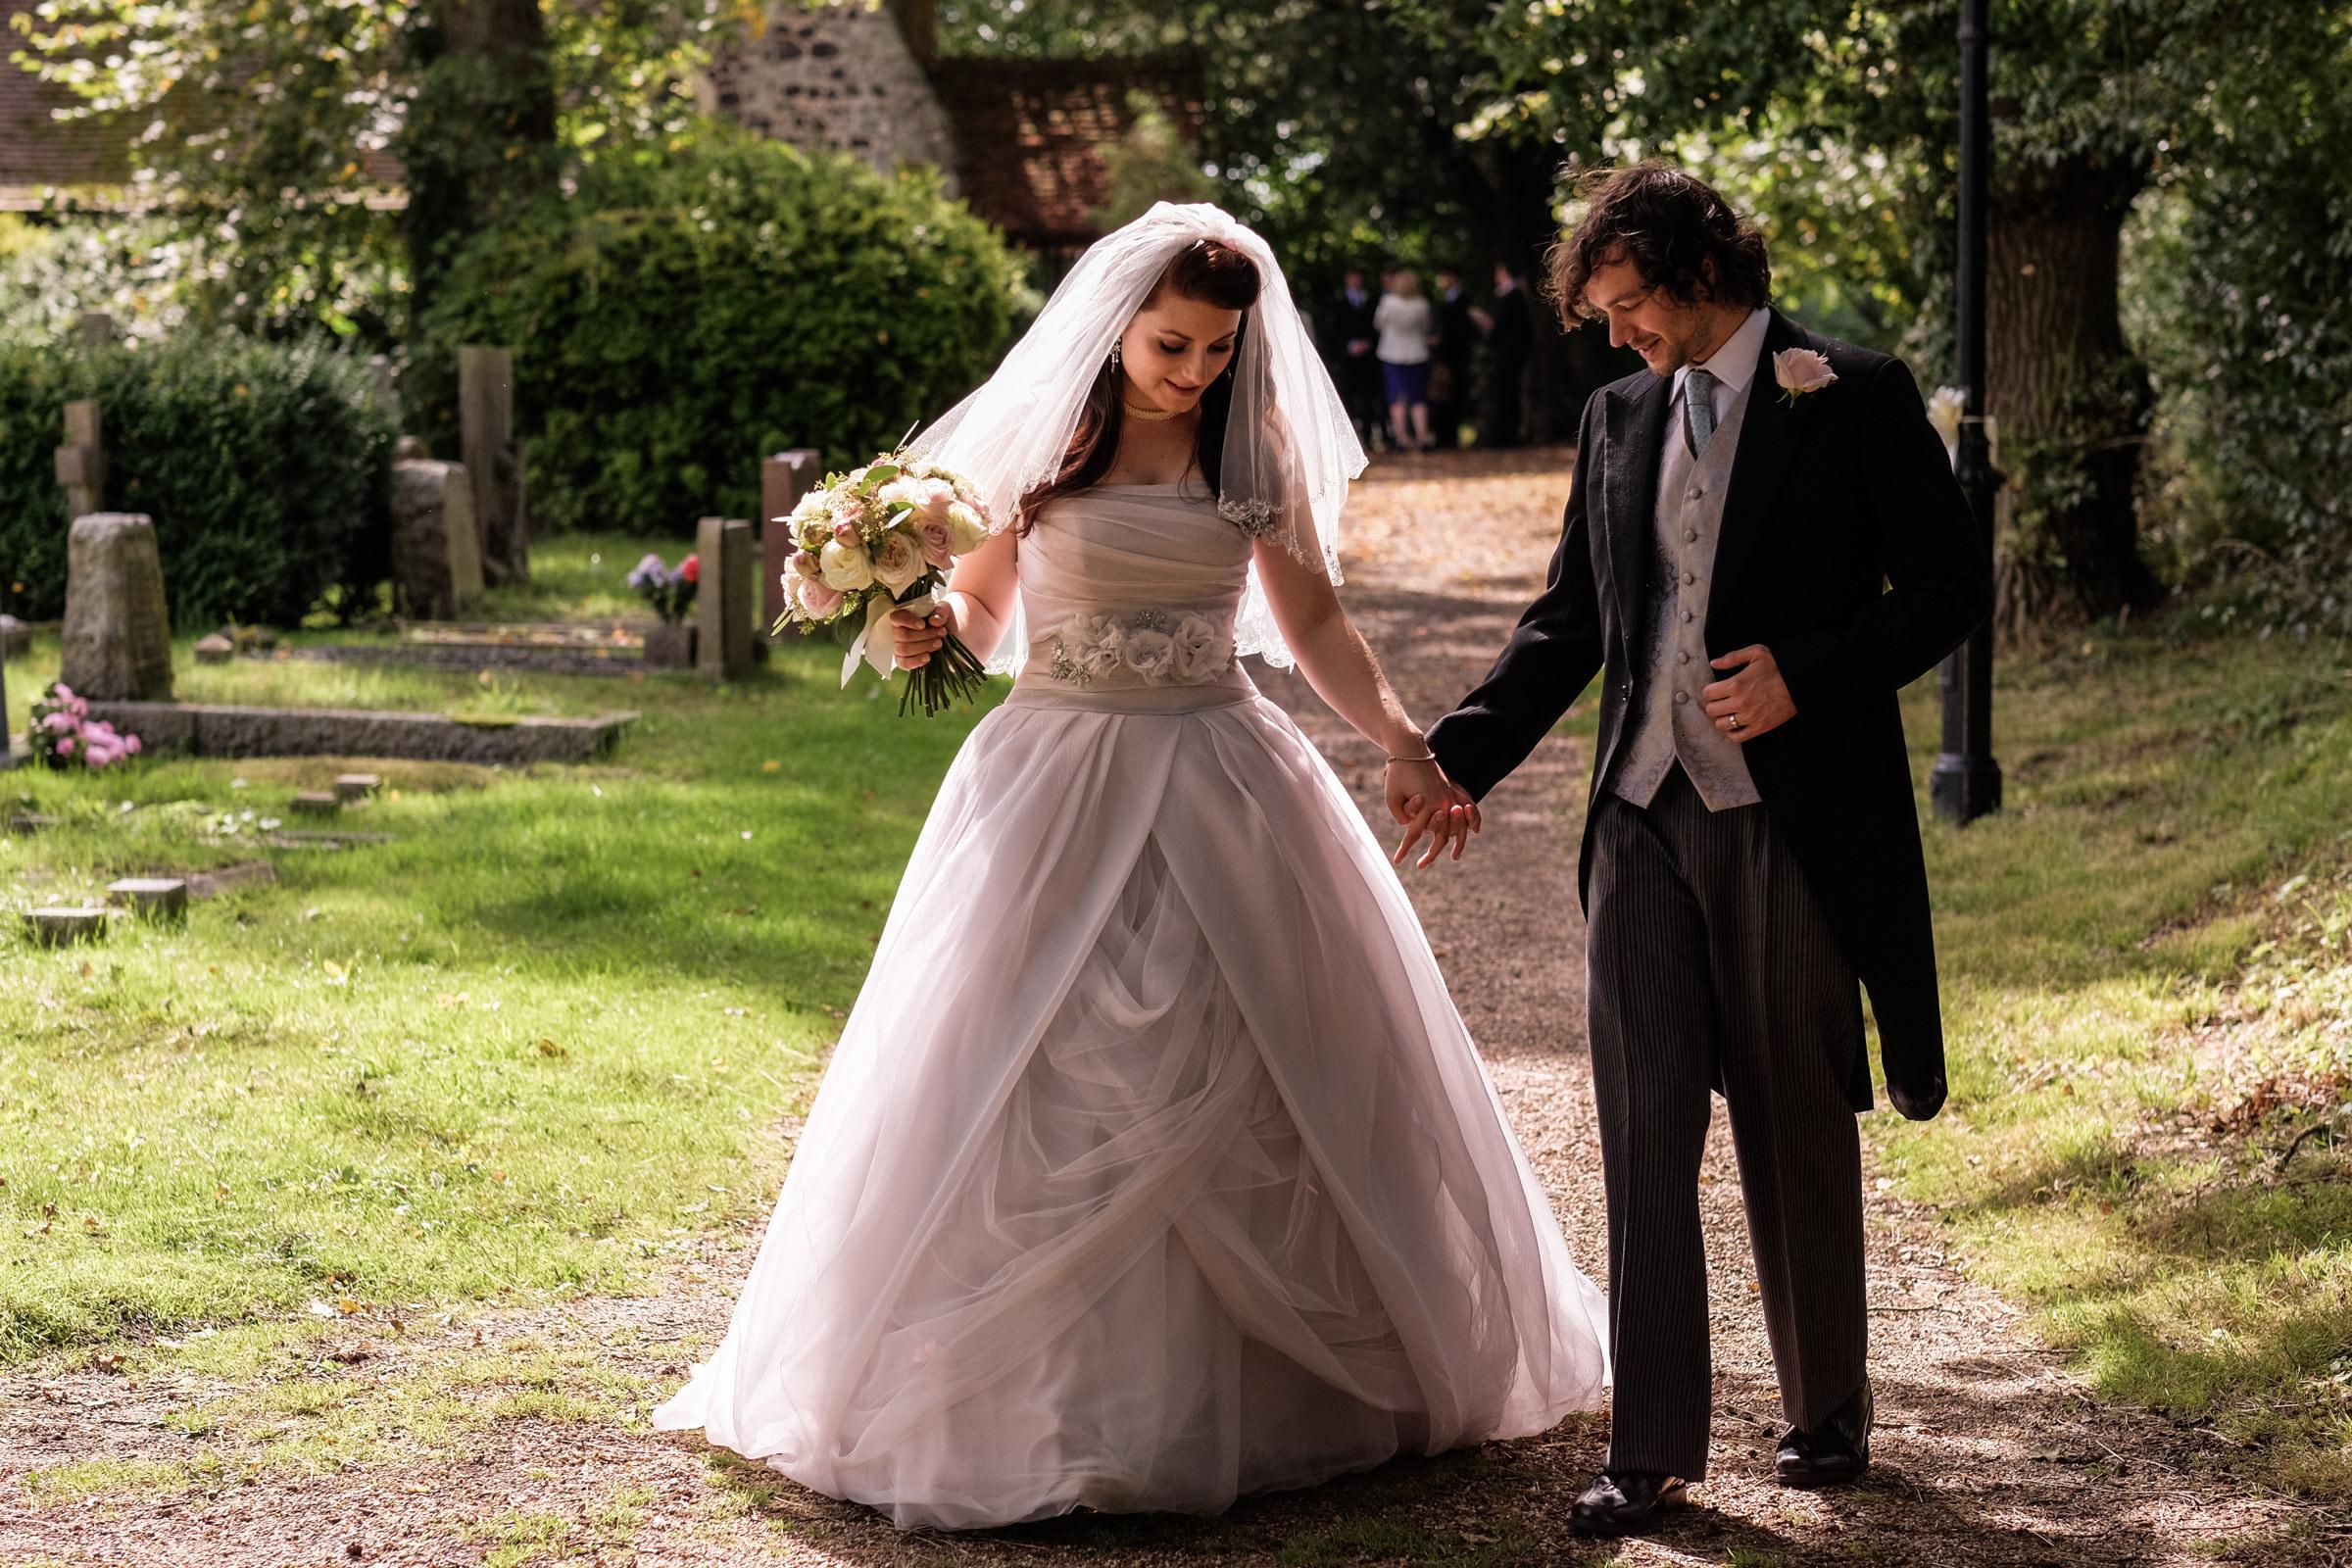 Wedding+at+De+Vere+Gorse+Hill+in+Surrey+018.jpg